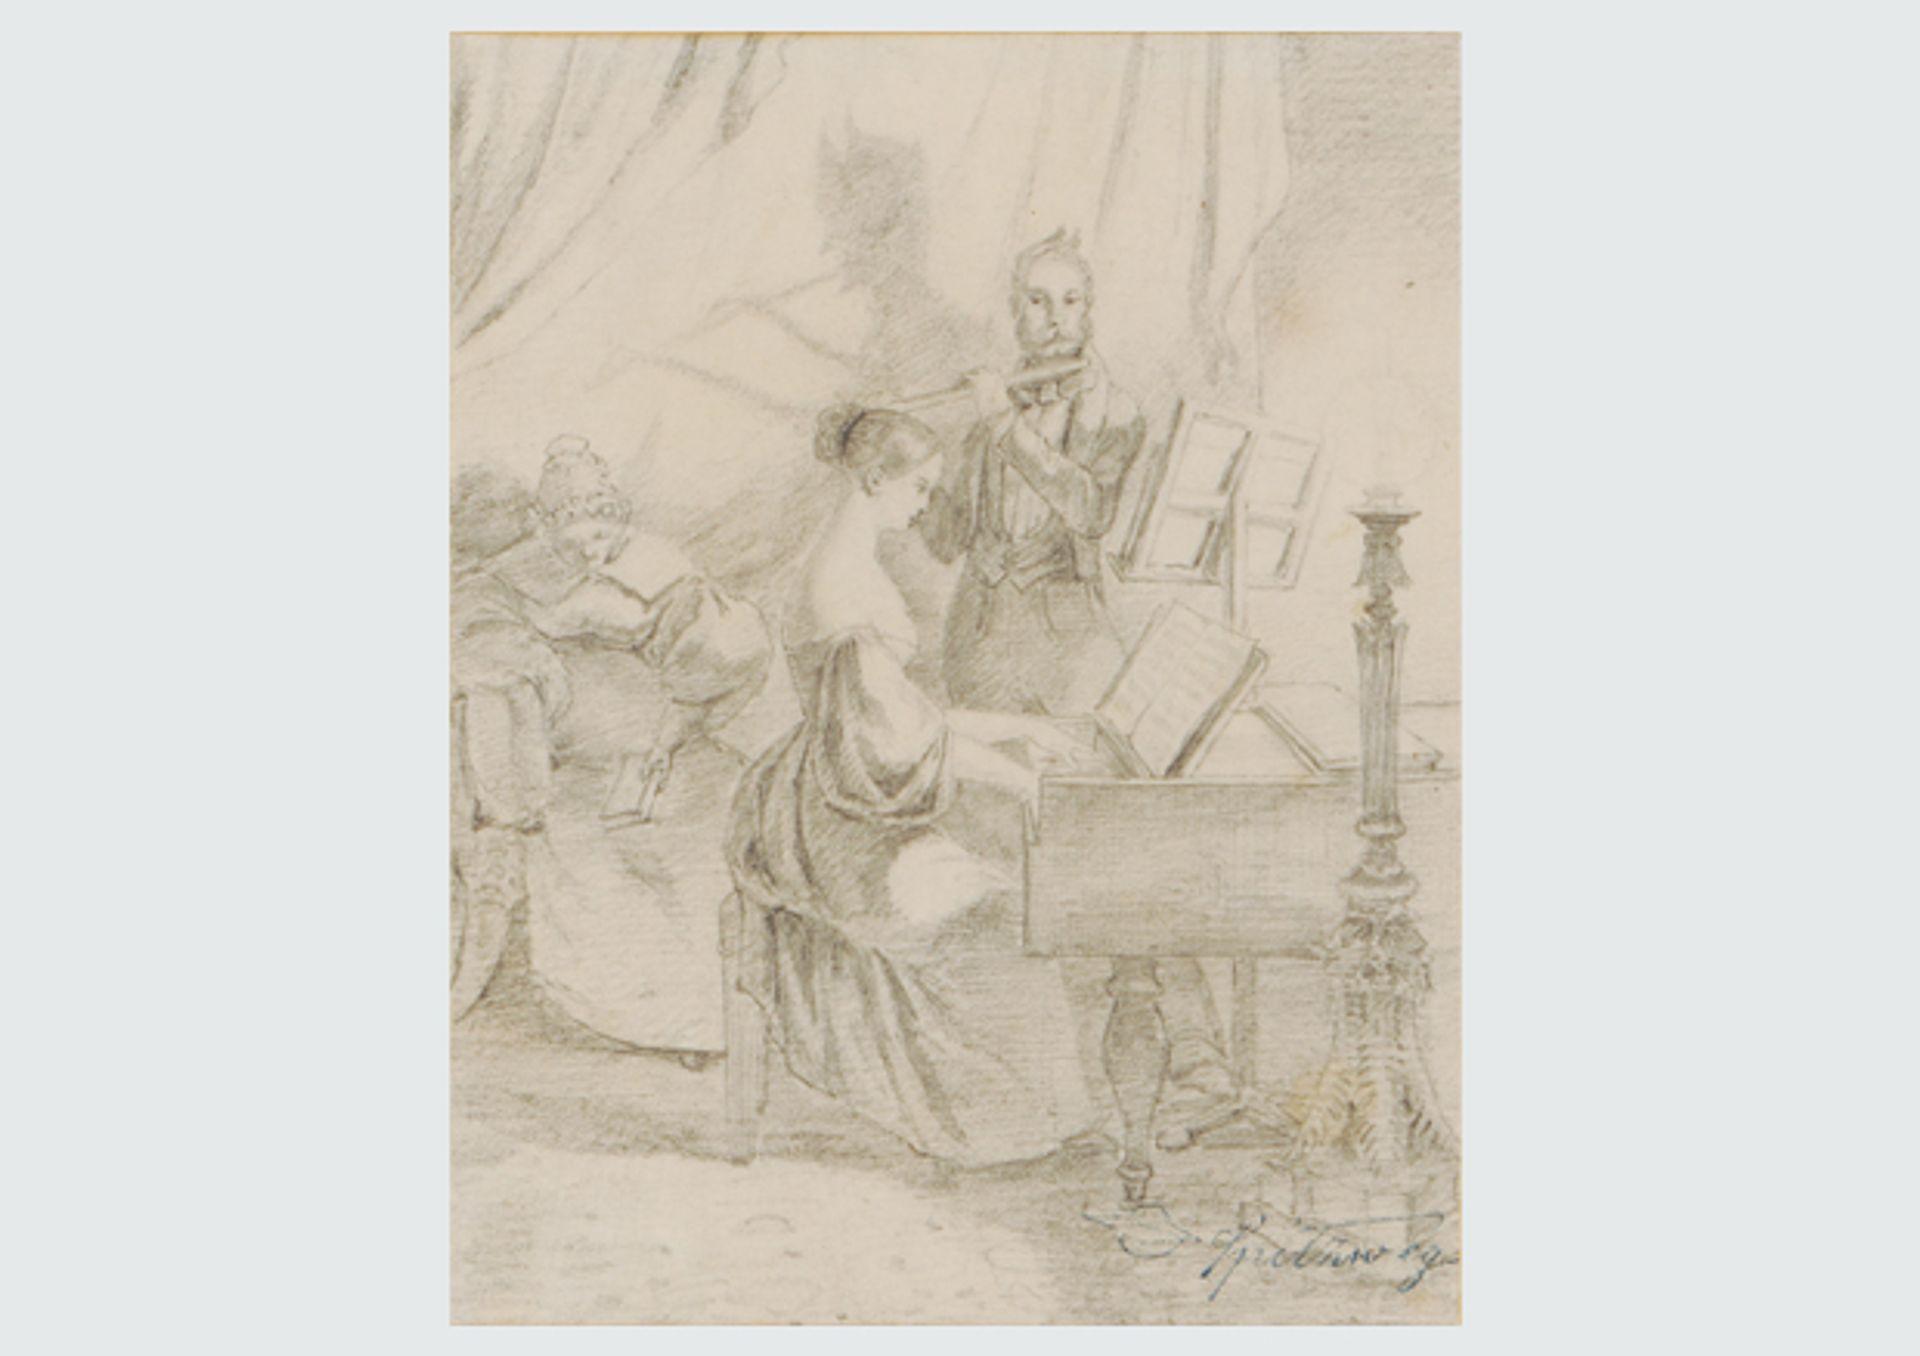 Carl Spitzweg's drawing Das Klavierspiel (1840)